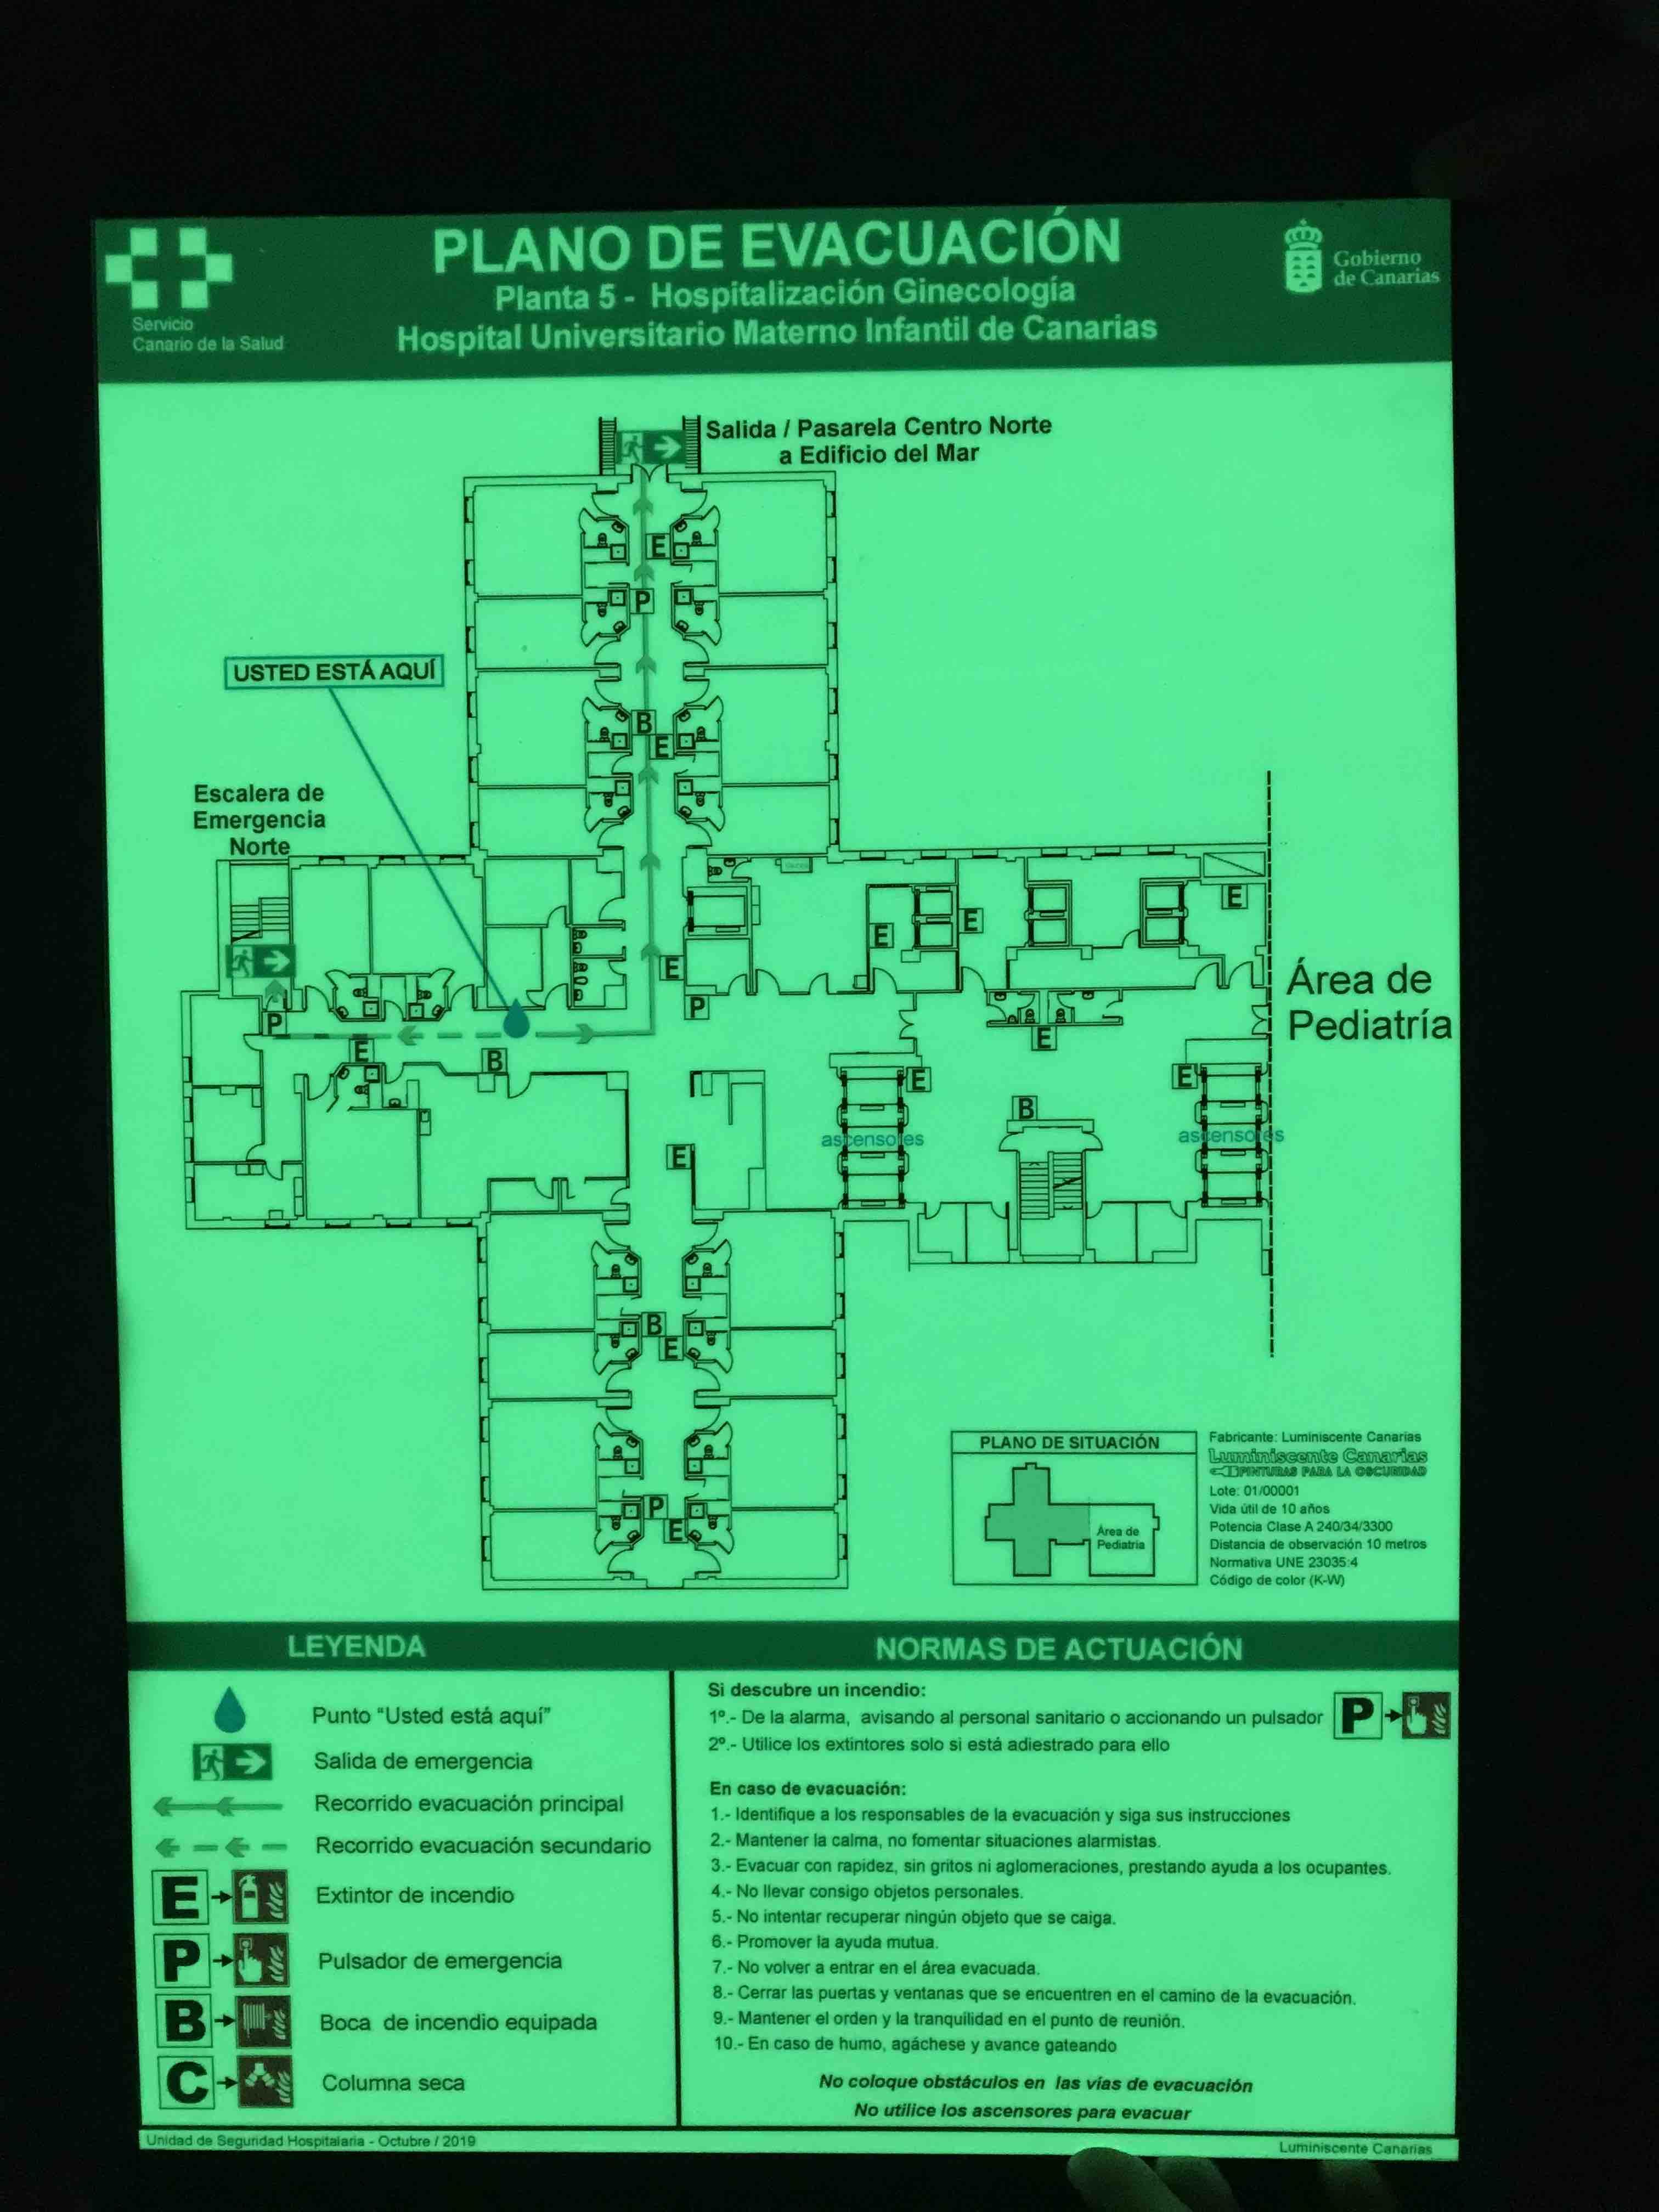 Fabricar planos de evacuación fotoluminiscente para edificios